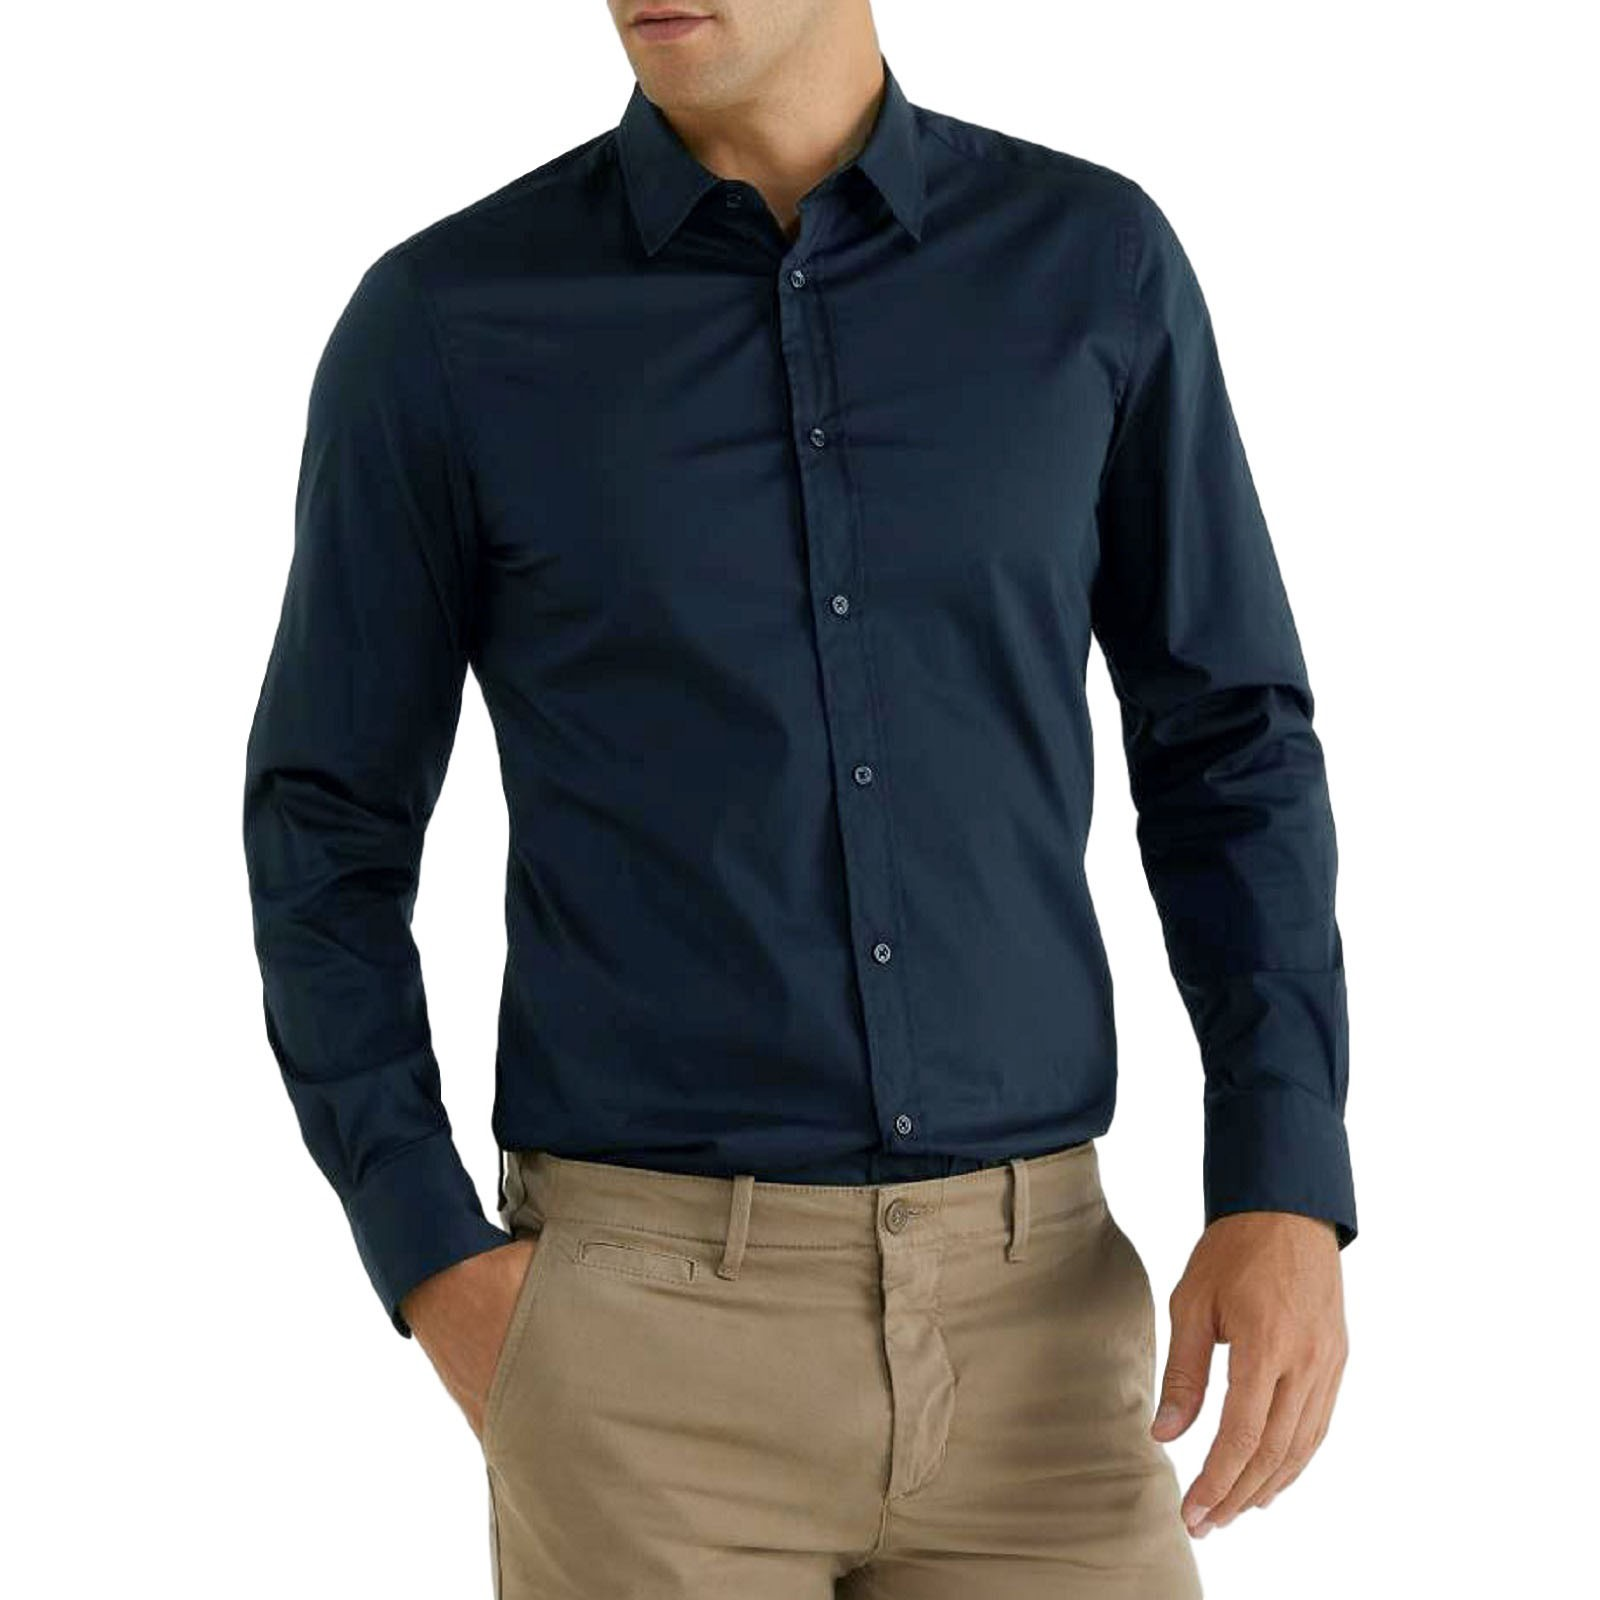 Camicia-Uomo-Celeste-Bianca-Slim-Fit-Manica-Lunga-Sartoriale-Cotone-TG-S-7XL miniatura 20